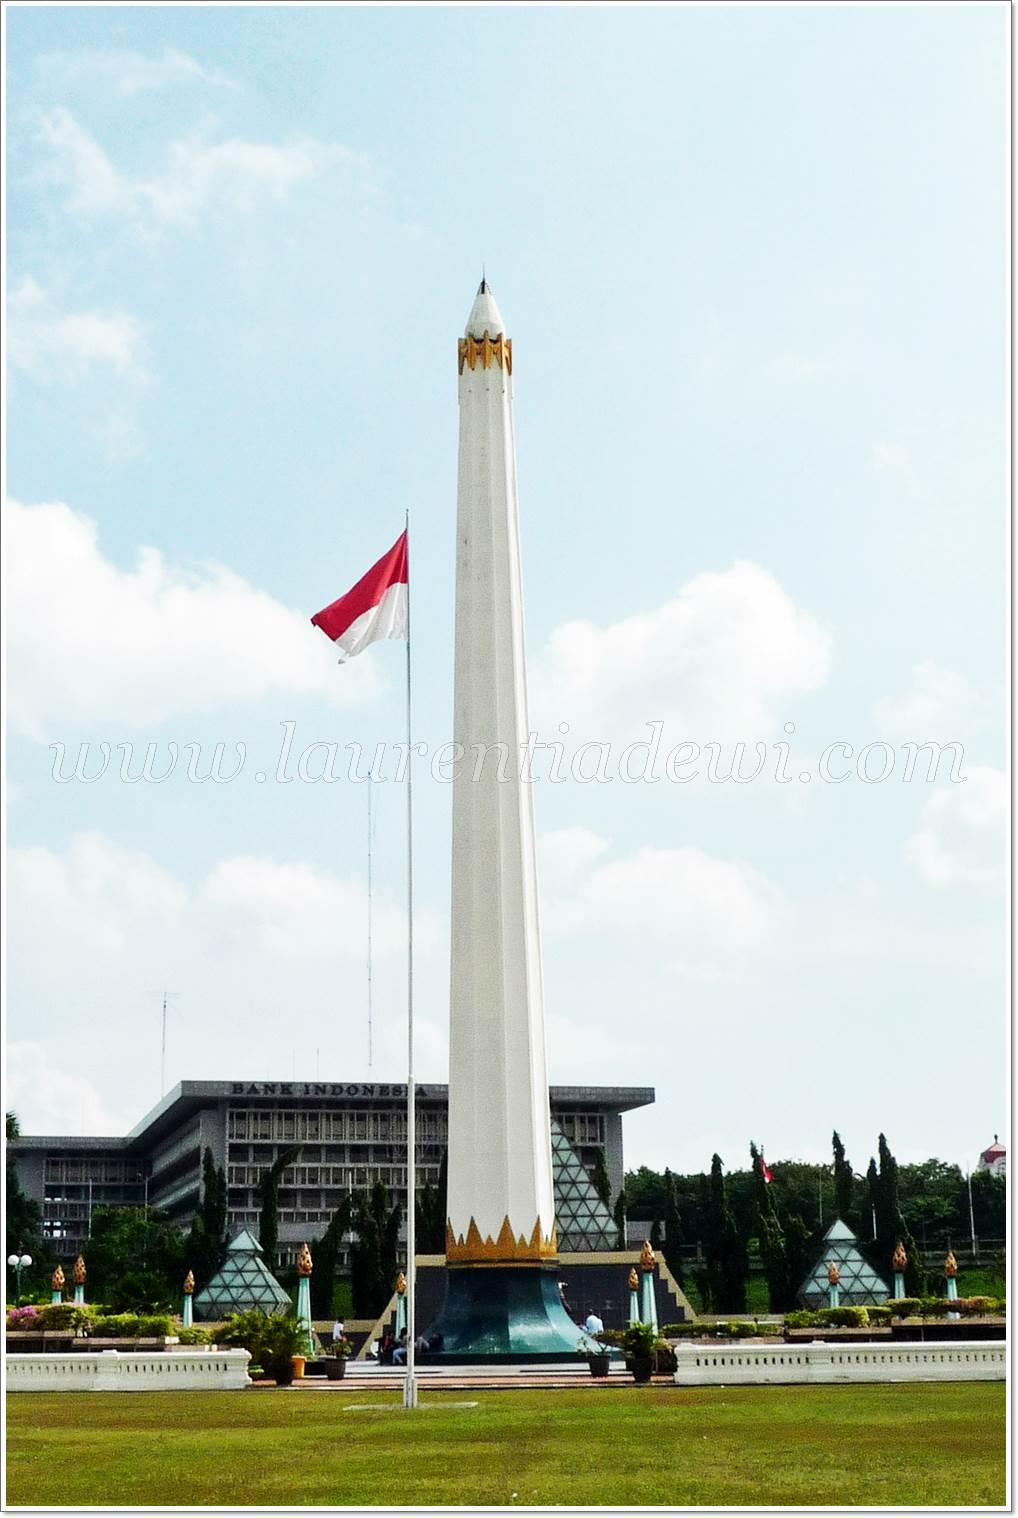 Tugu Pahlawan Surabaya Monumen Makam Tak Dikenal Sebuah Menjadi Markah